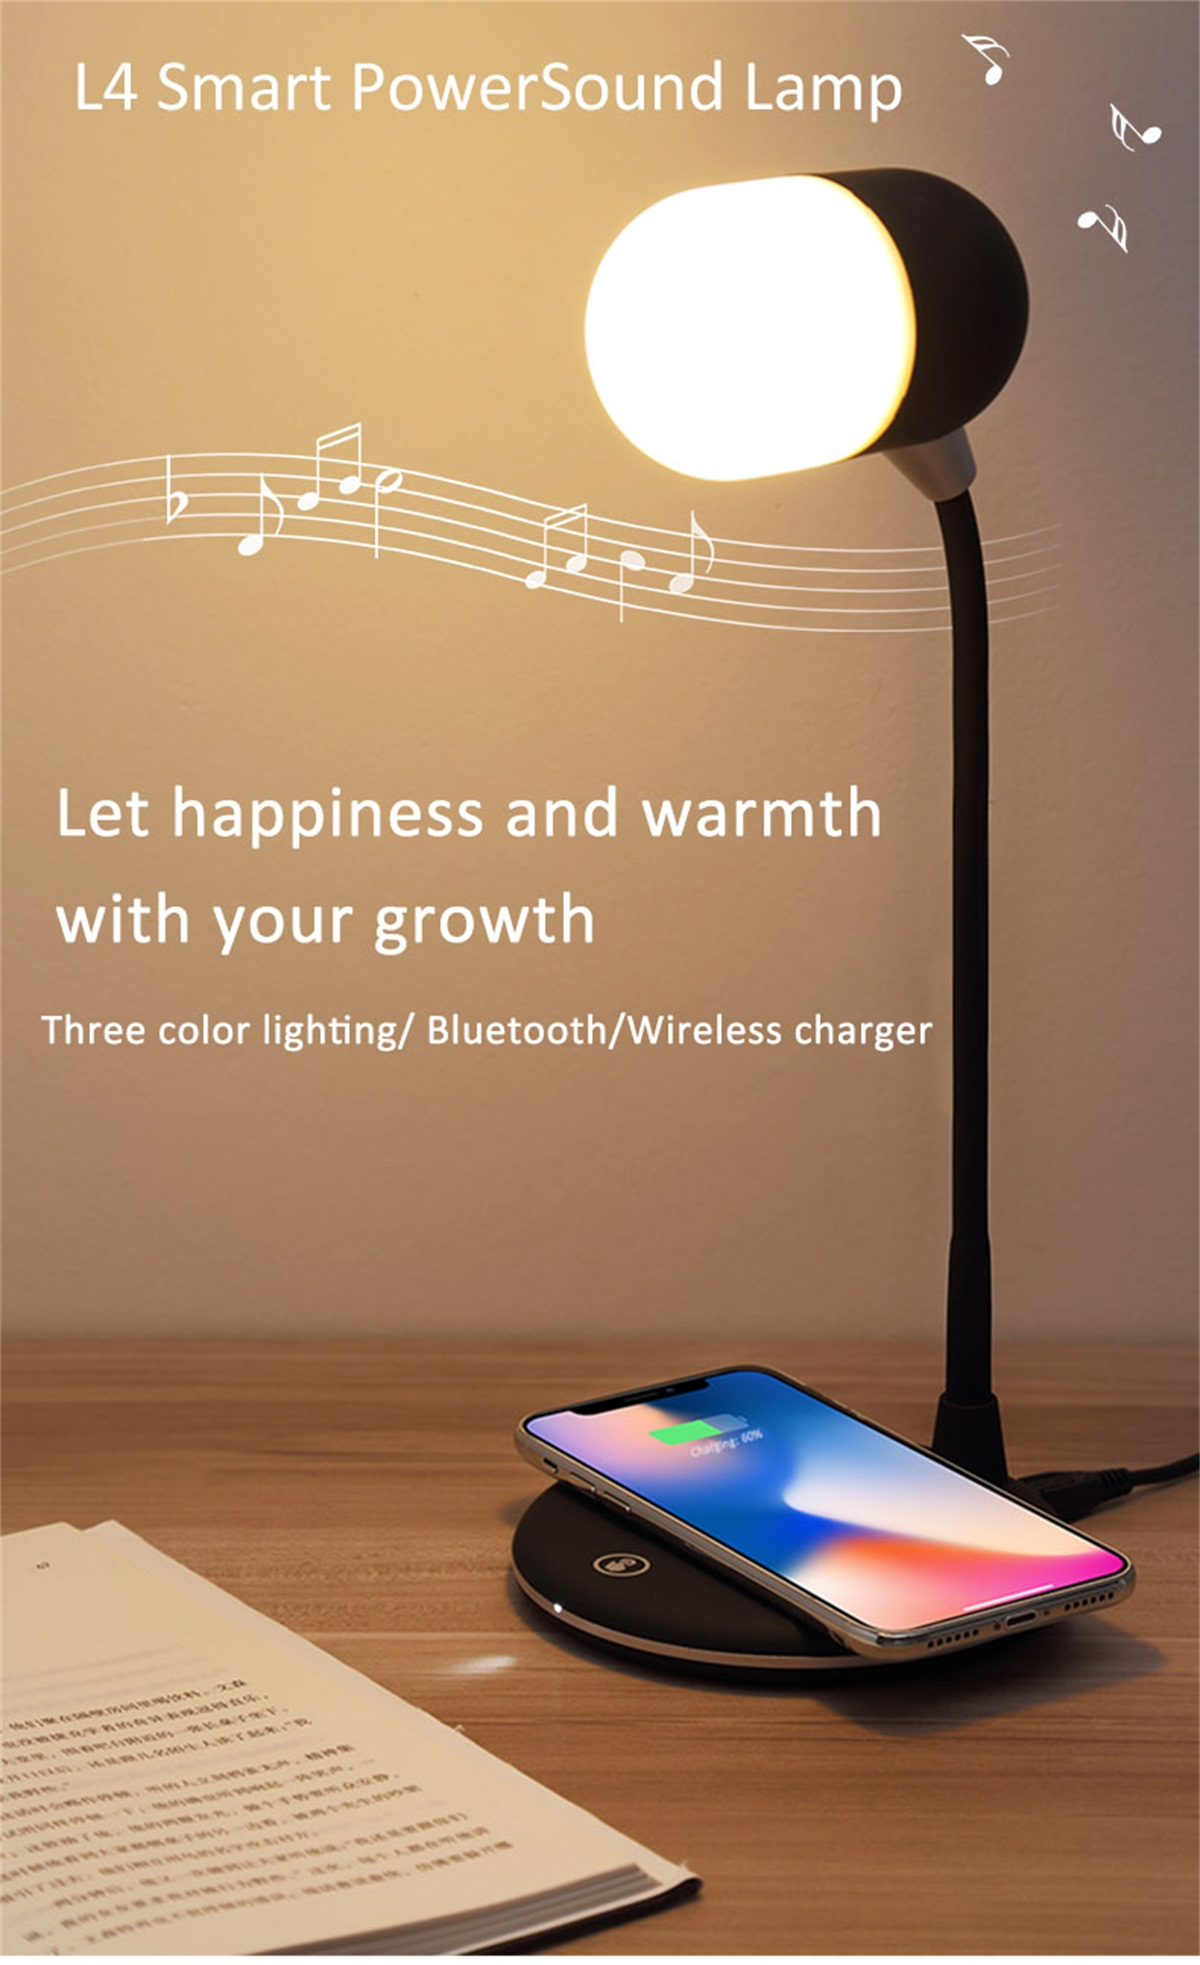 The Smart Lamp